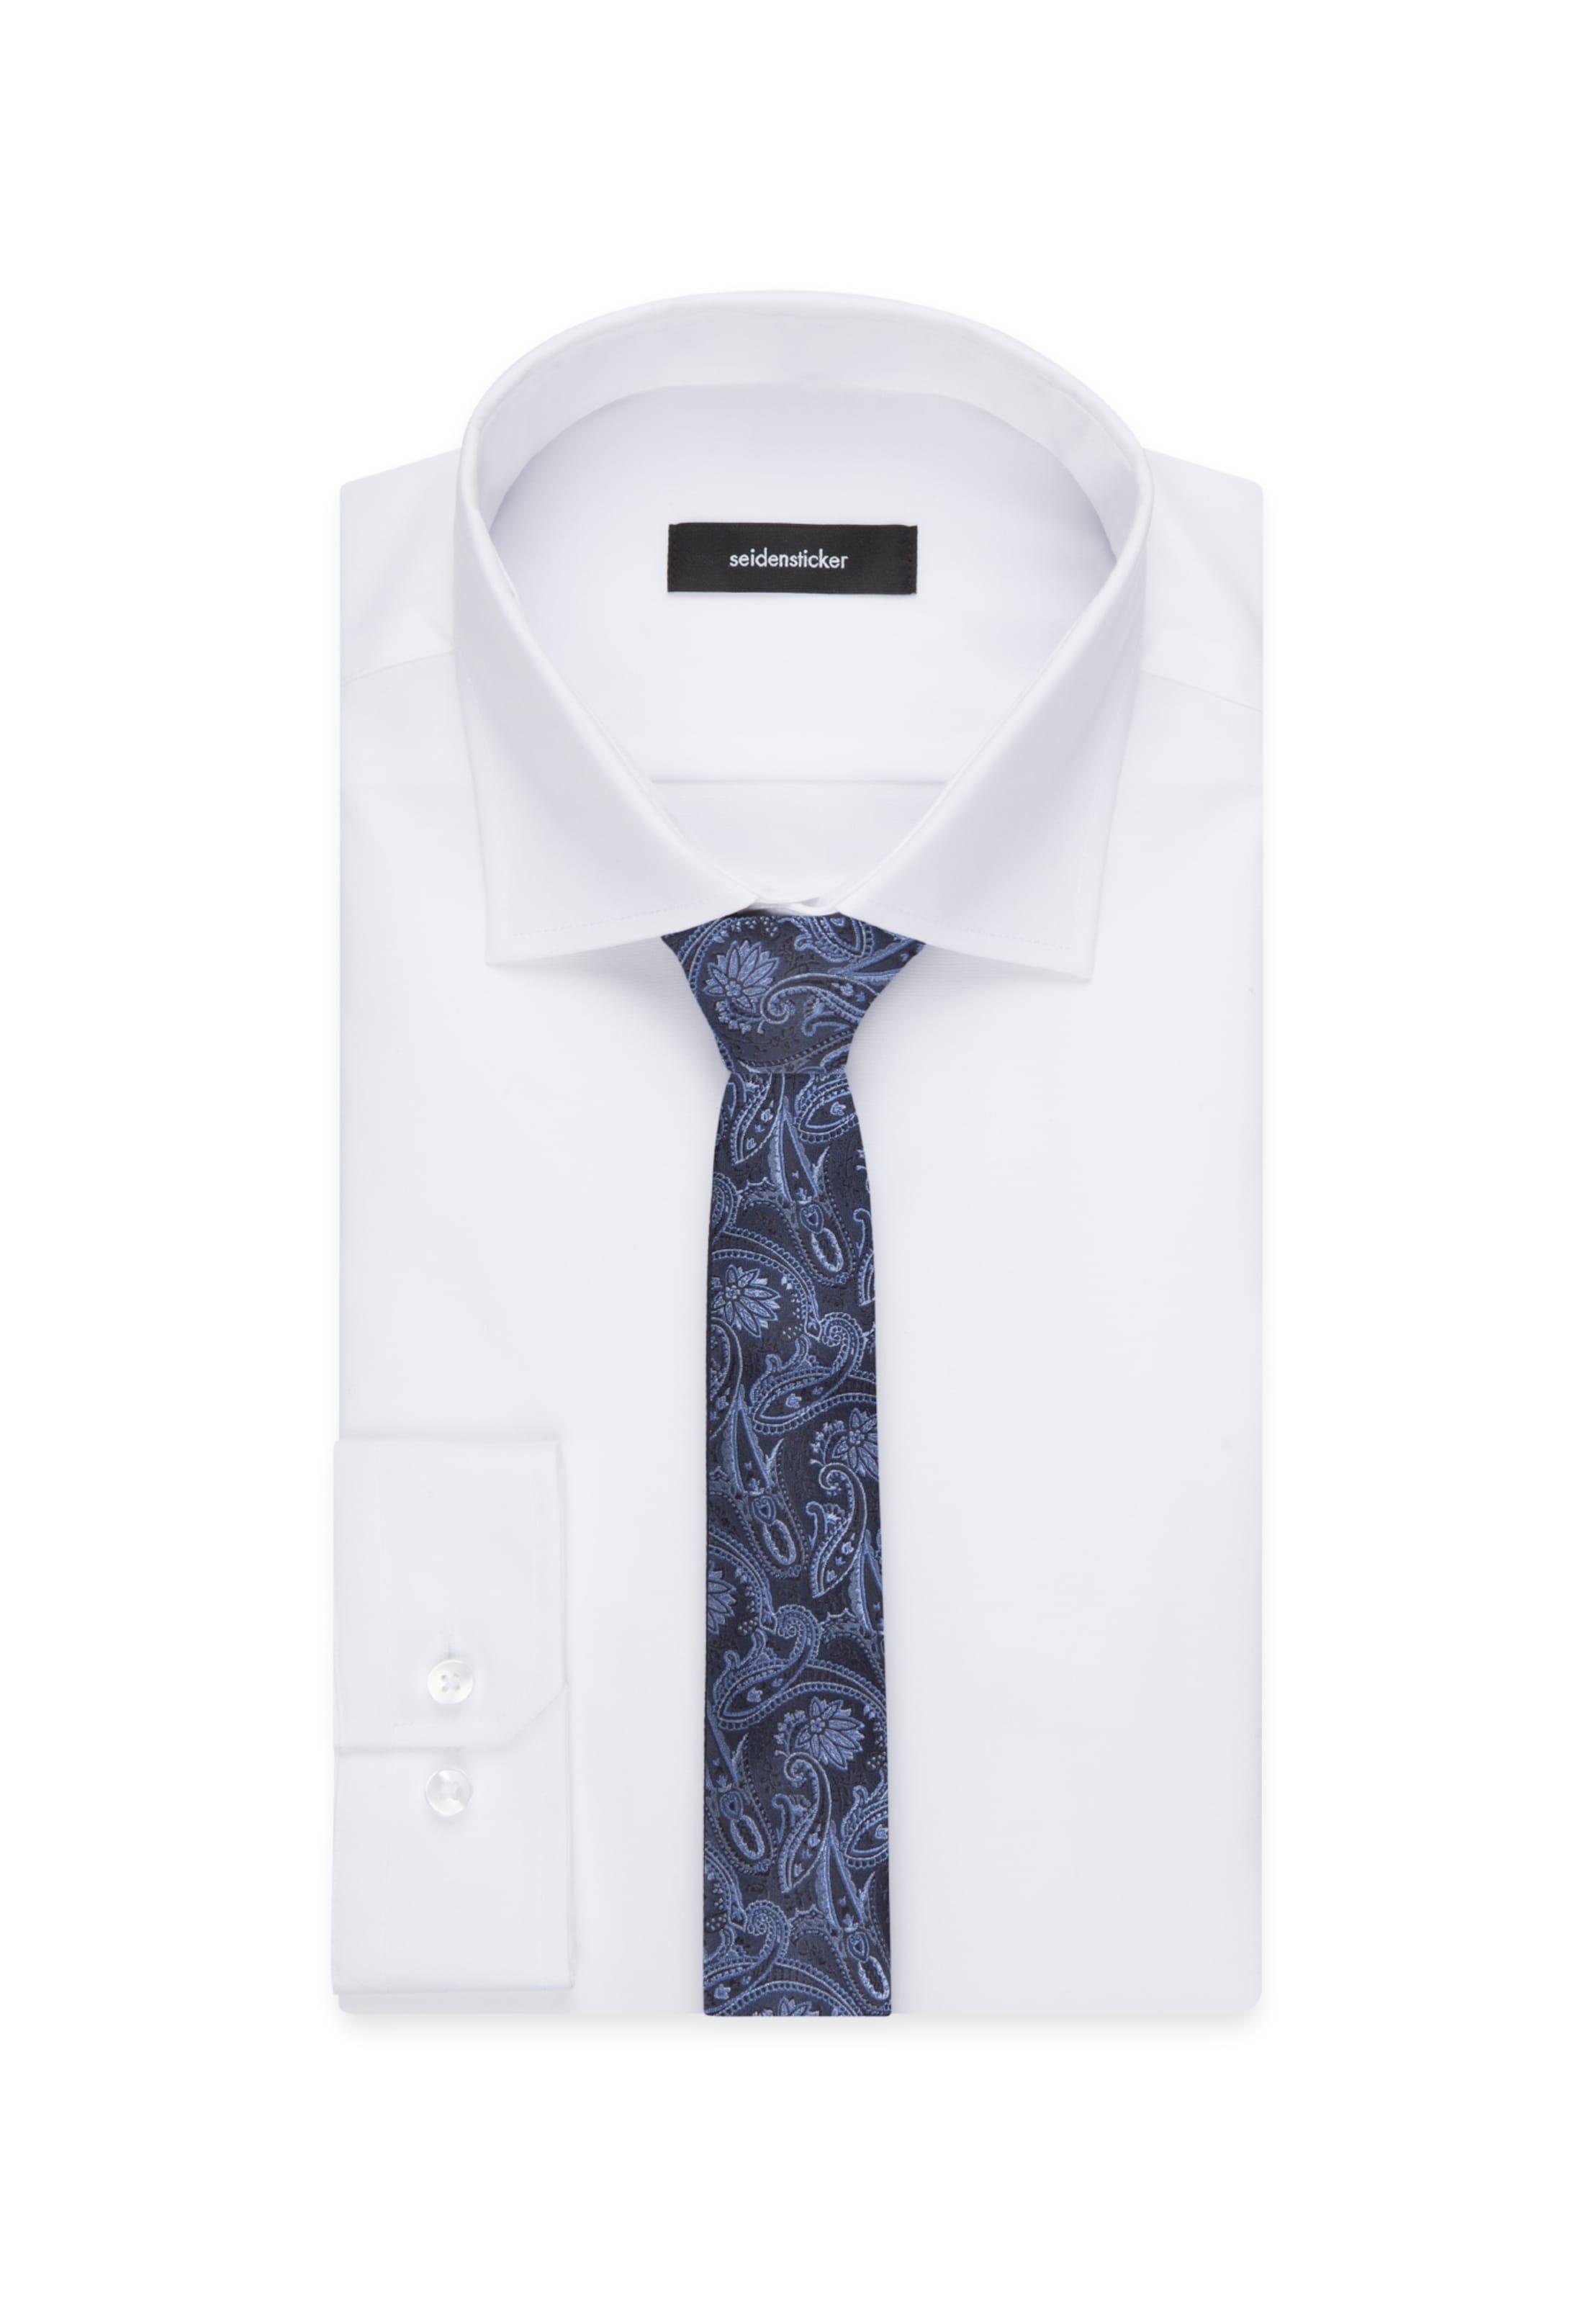 In In In RoyalblauDunkelblau Seidensticker Seidensticker Krawatte Krawatte Krawatte RoyalblauDunkelblau Seidensticker 3Lq45ARj